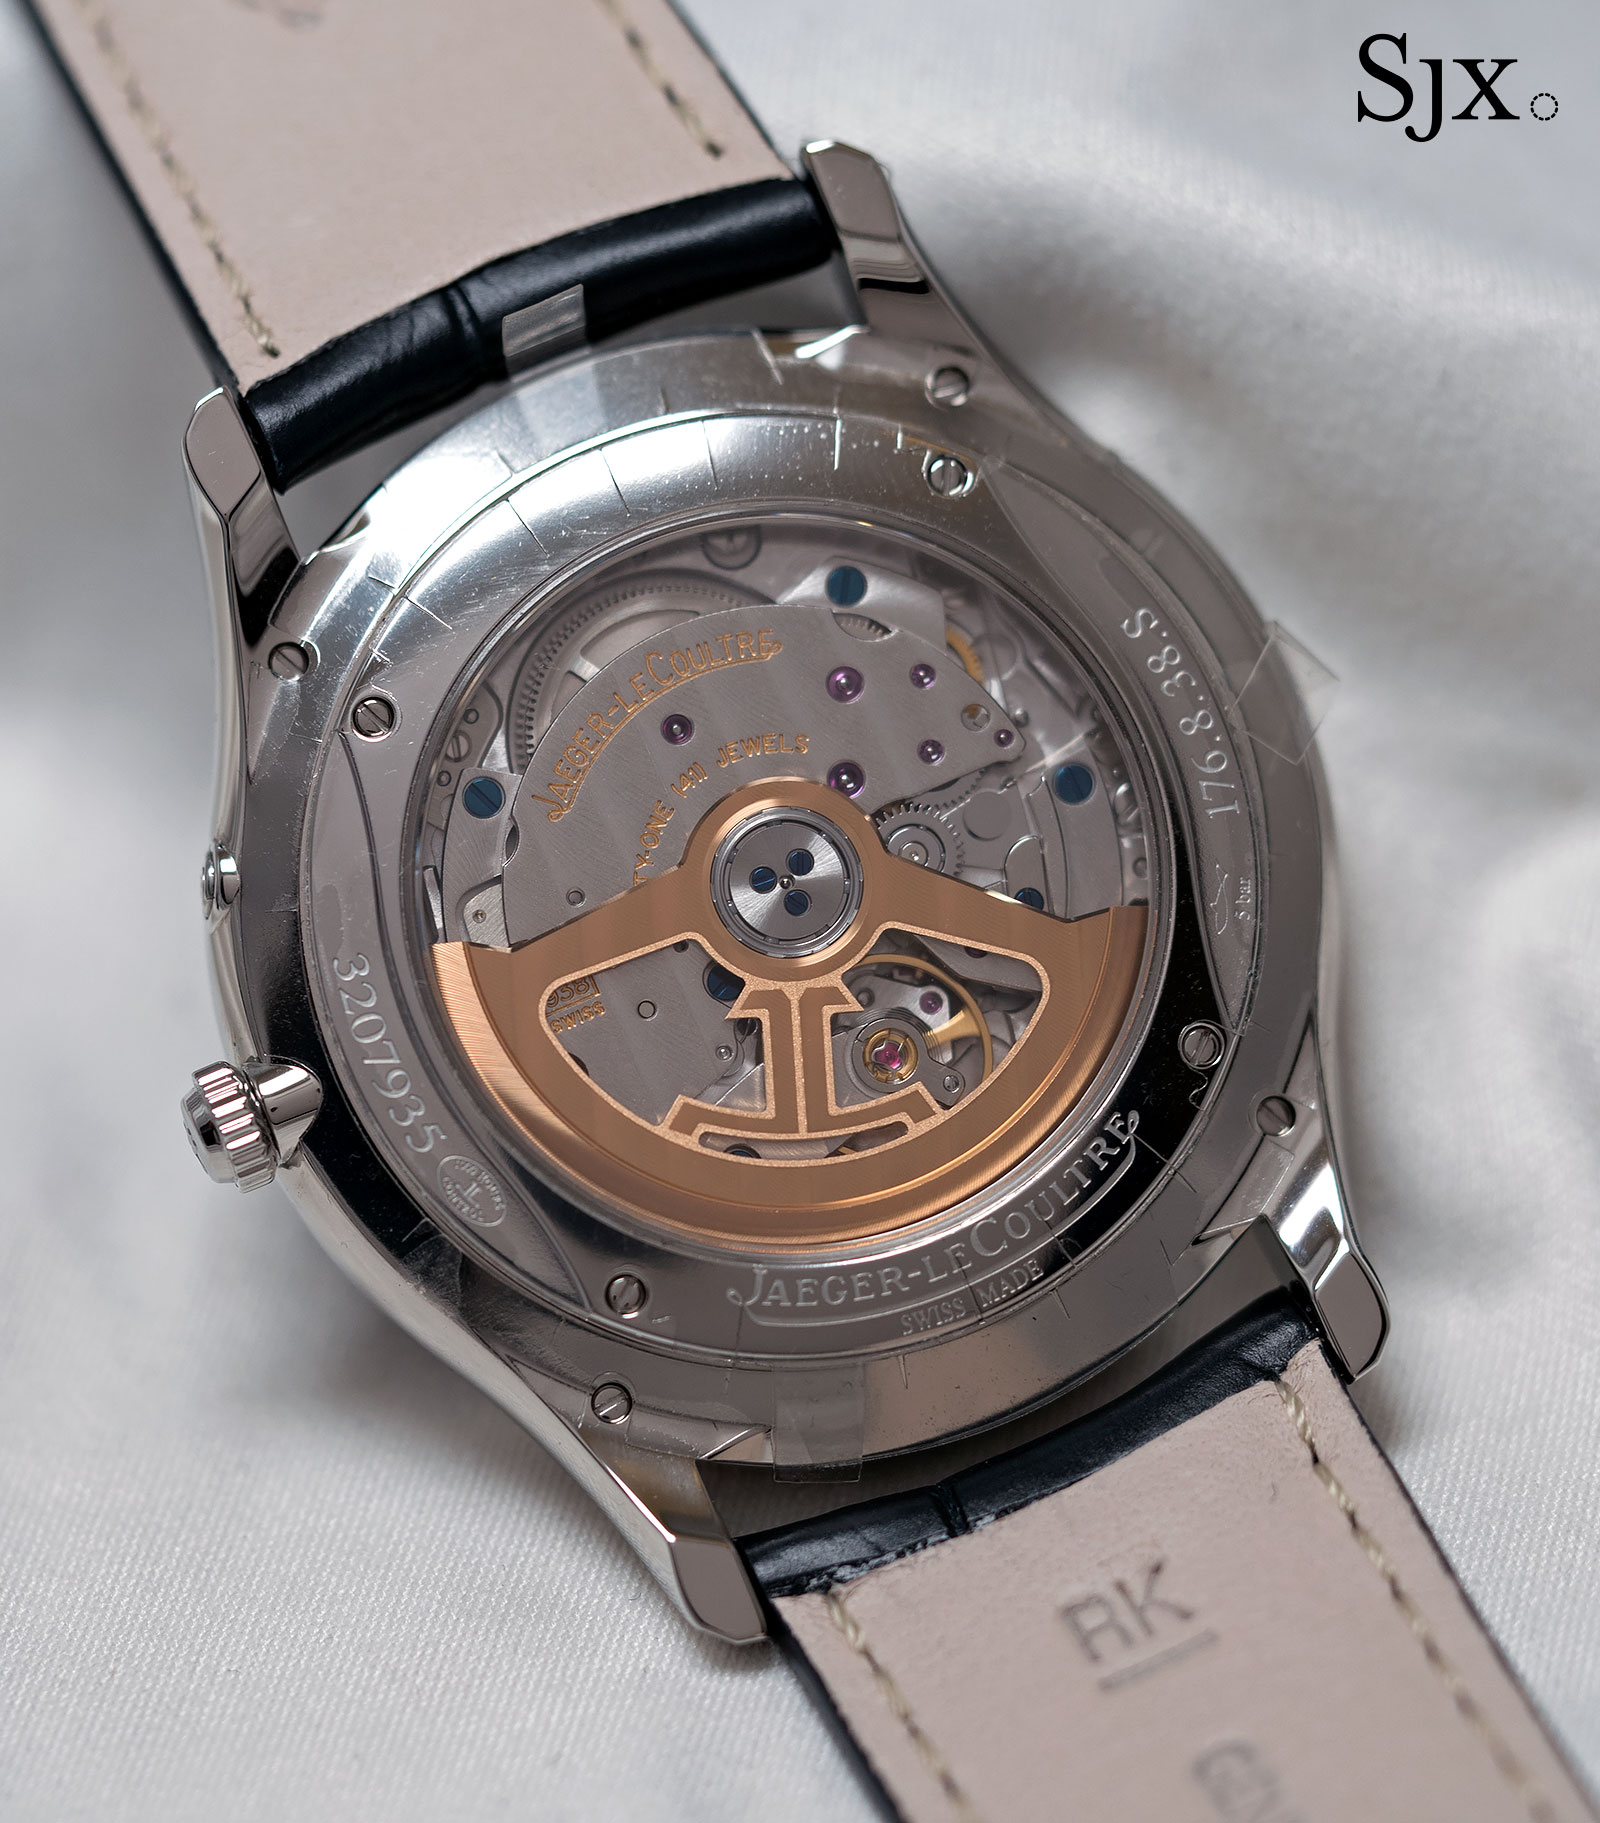 Jaeger-LeCoultre Master Ultra Thin Reserve de marche blue dial 4